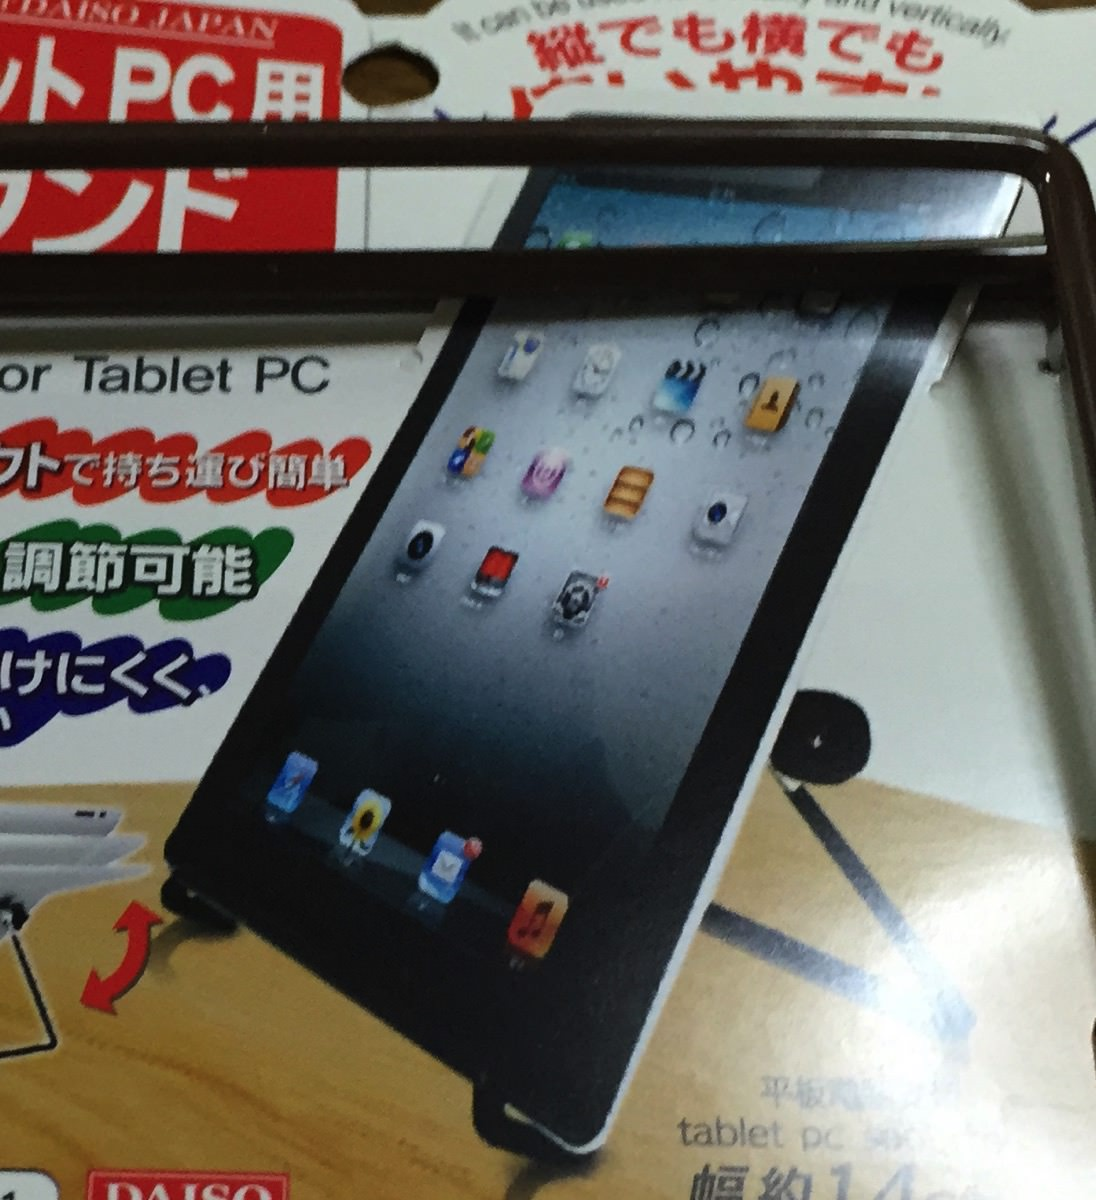 iPadを縦に立てているイラスト